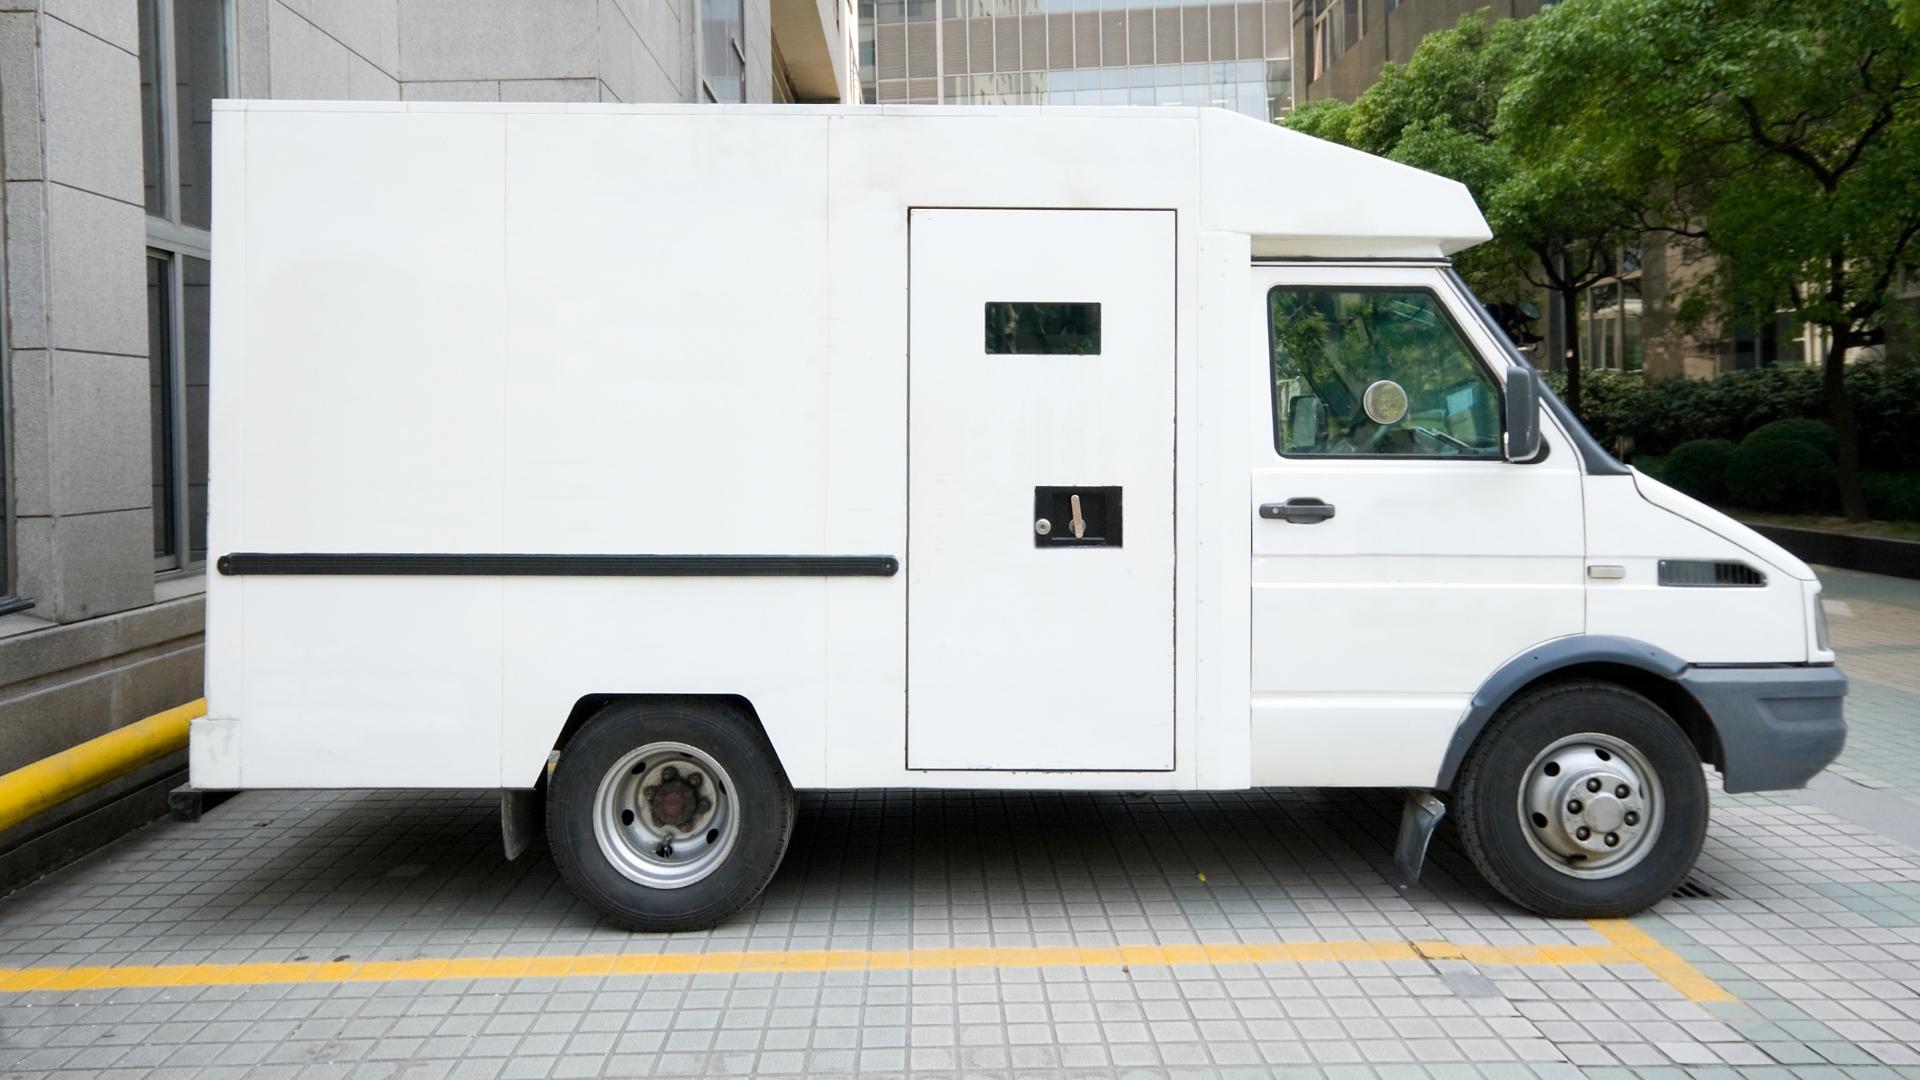 Transport samochodem opancerzonym